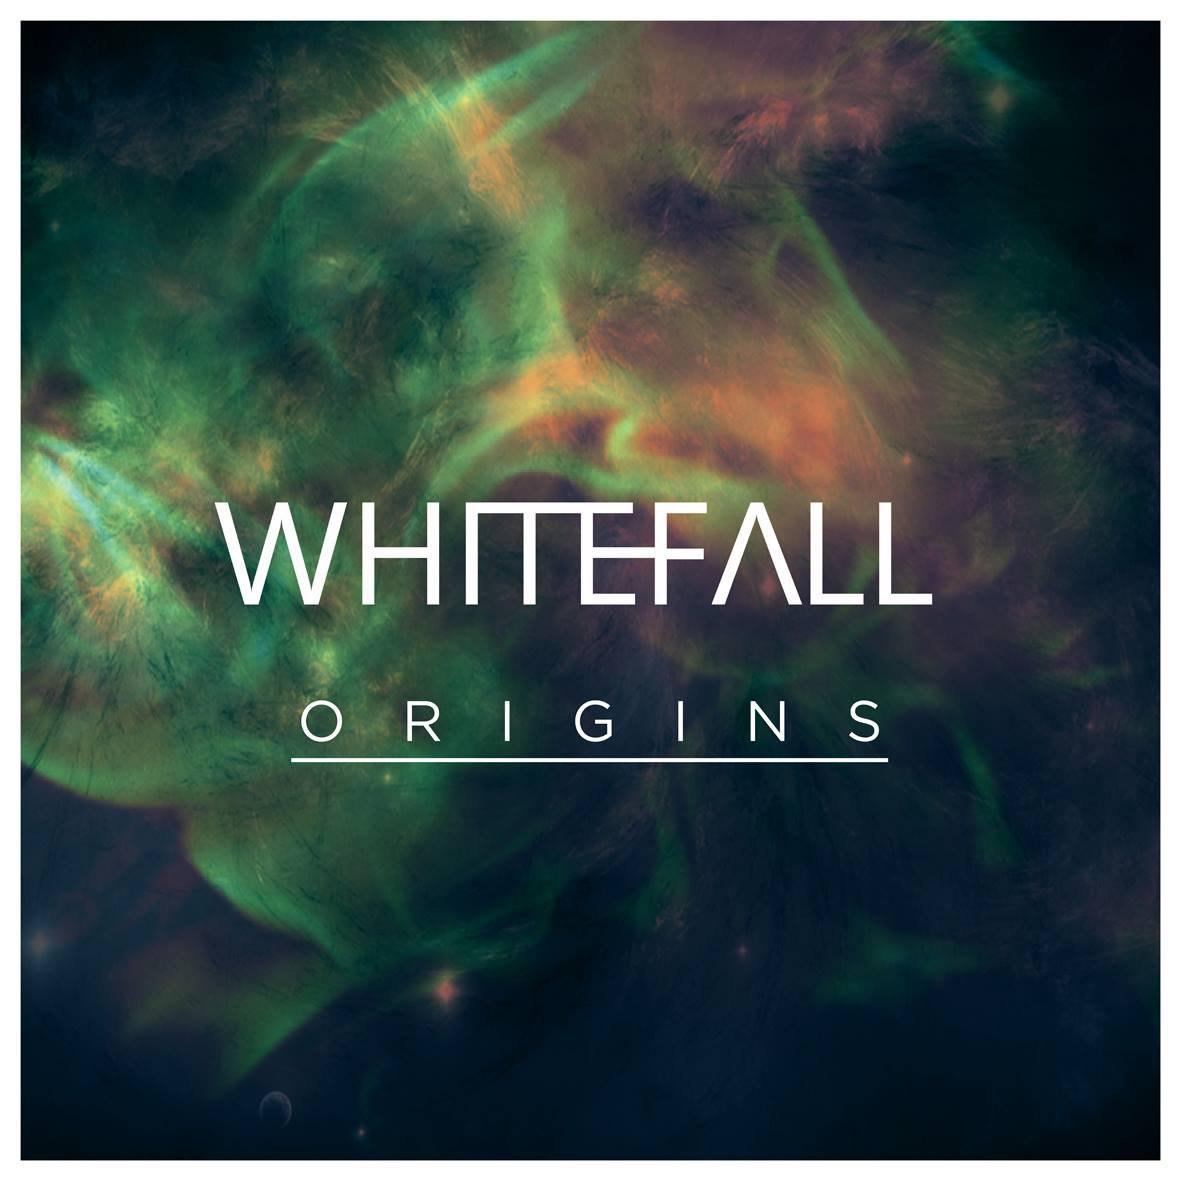 Whitefall - Causality / Dreamweaver [Singles] (2015)